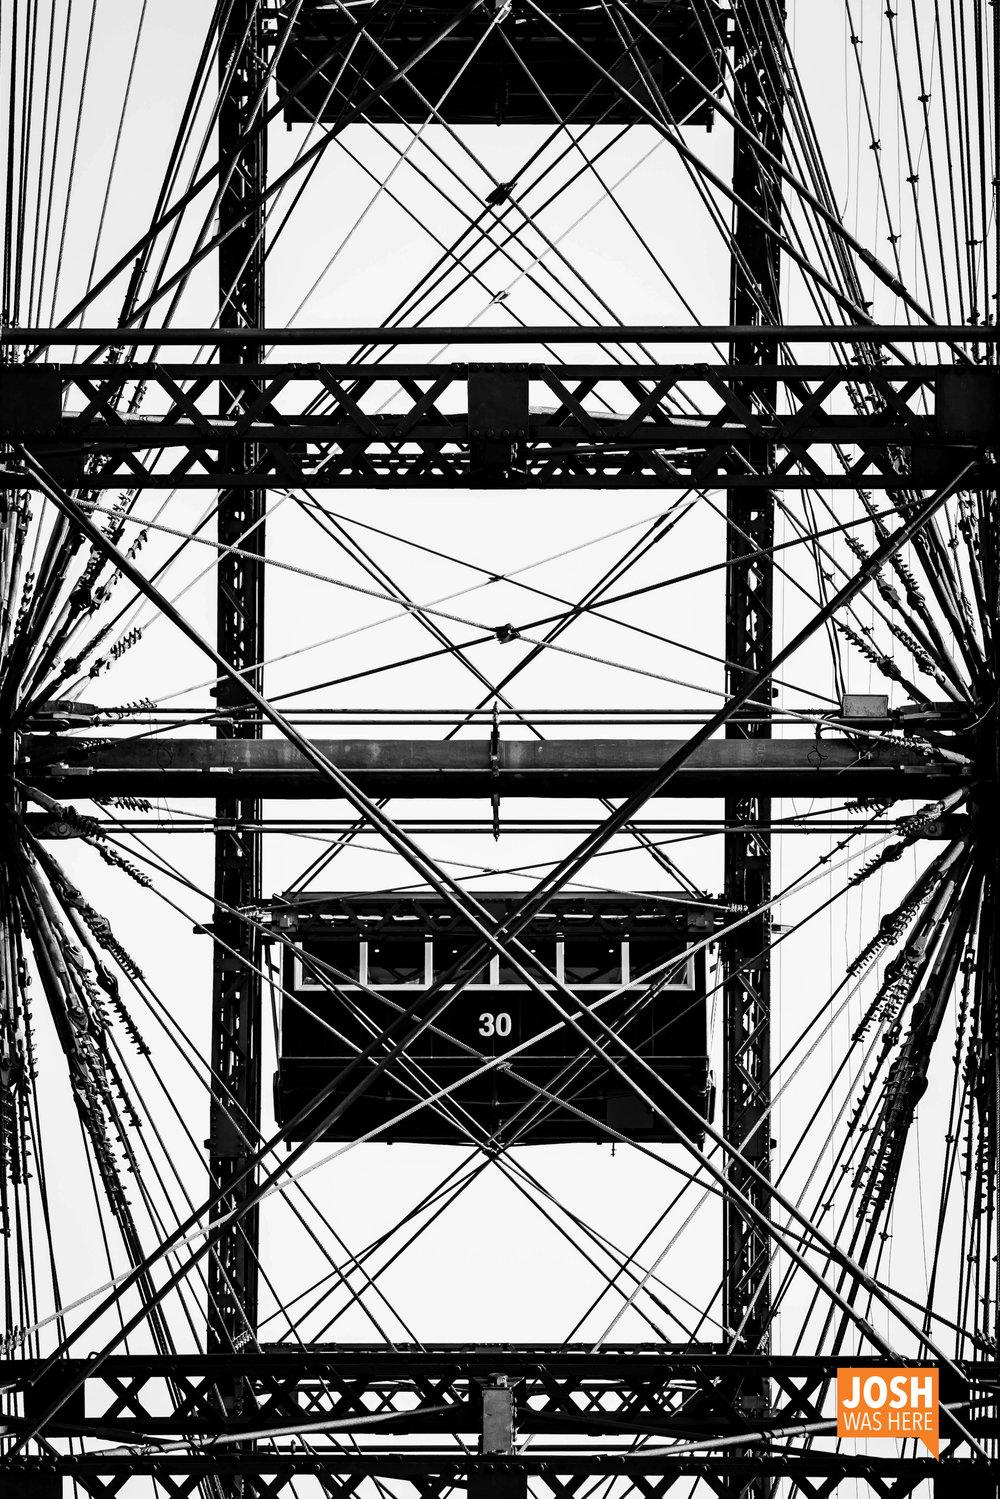 30, Viennese Giant Ferris Wheel / Wiener Reisenrad